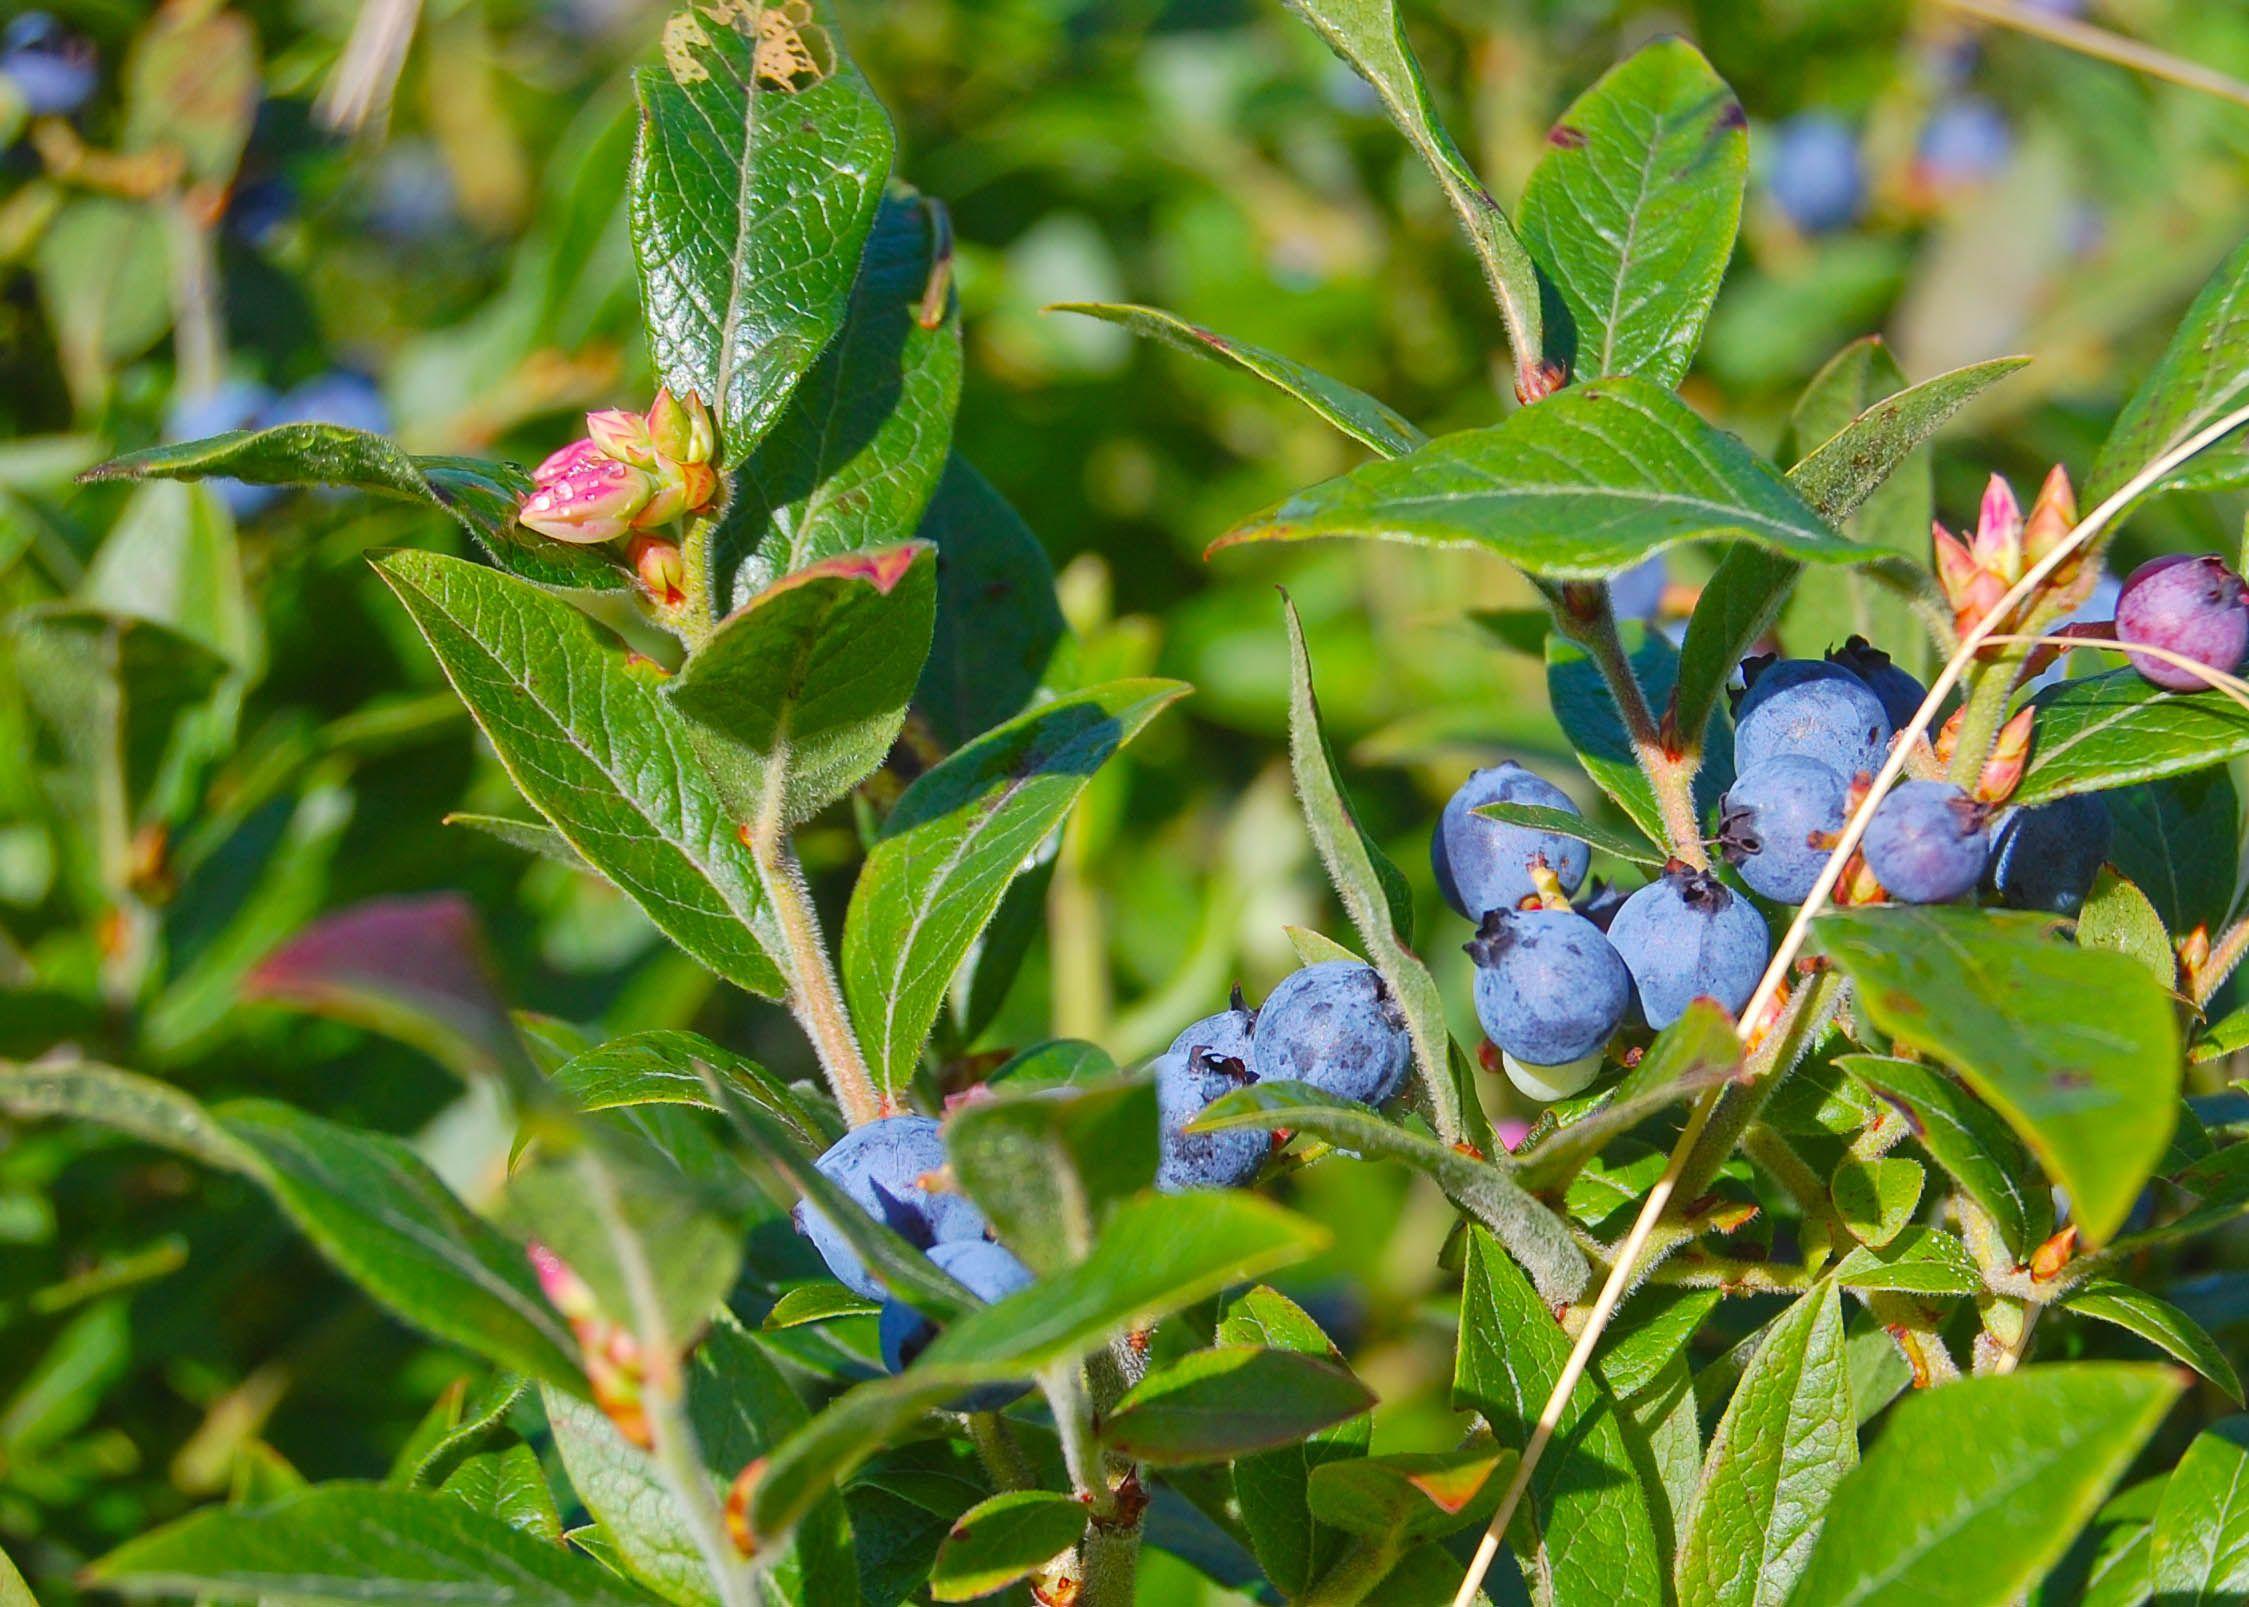 Growing Blueberries in the Home Garden